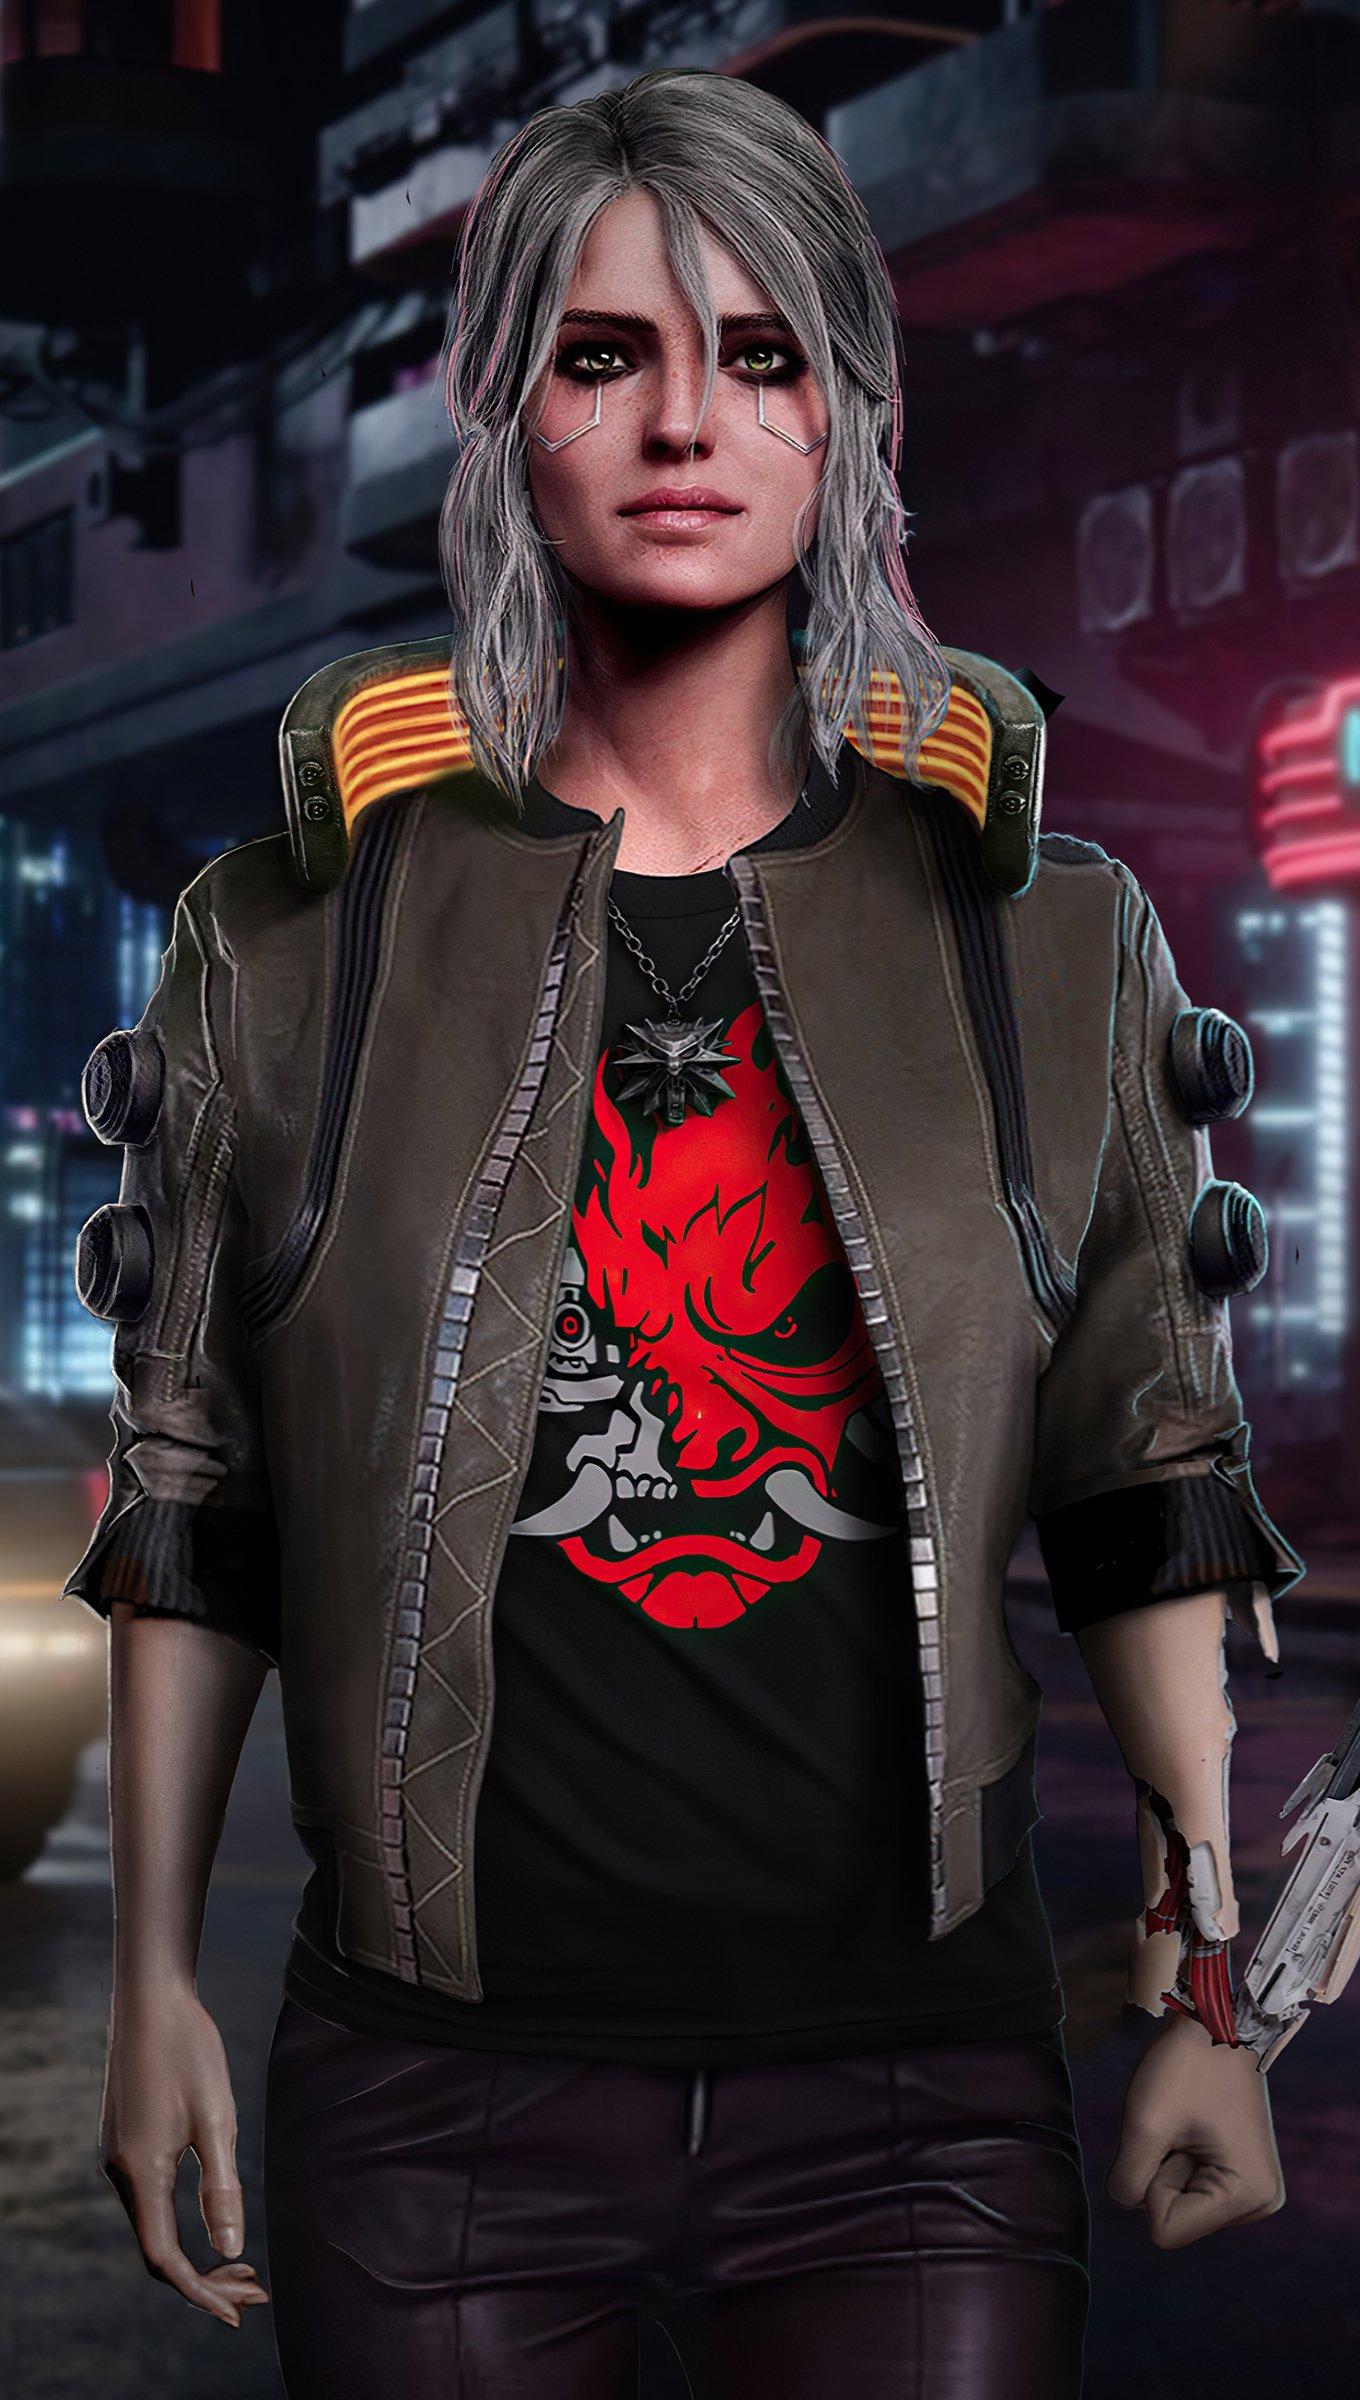 Fondos de pantalla Ciri Cyberpunk 2077 Fanart Vertical